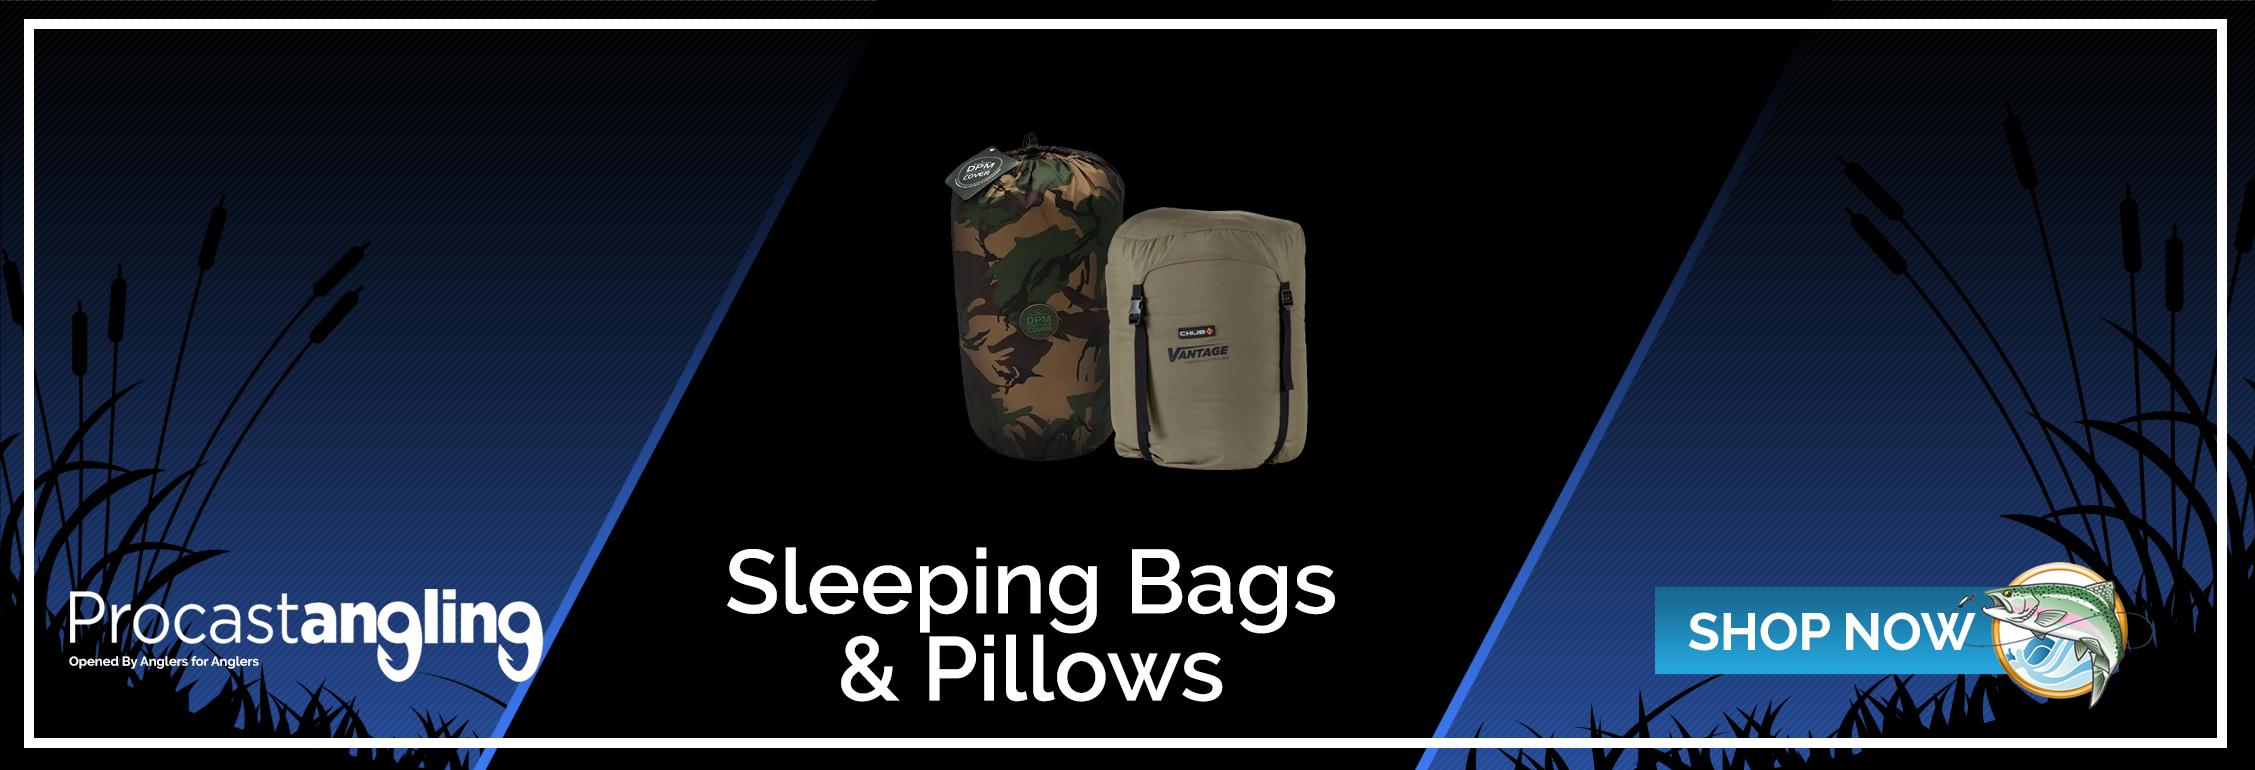 SLEEPING BAGS & PILLOWS